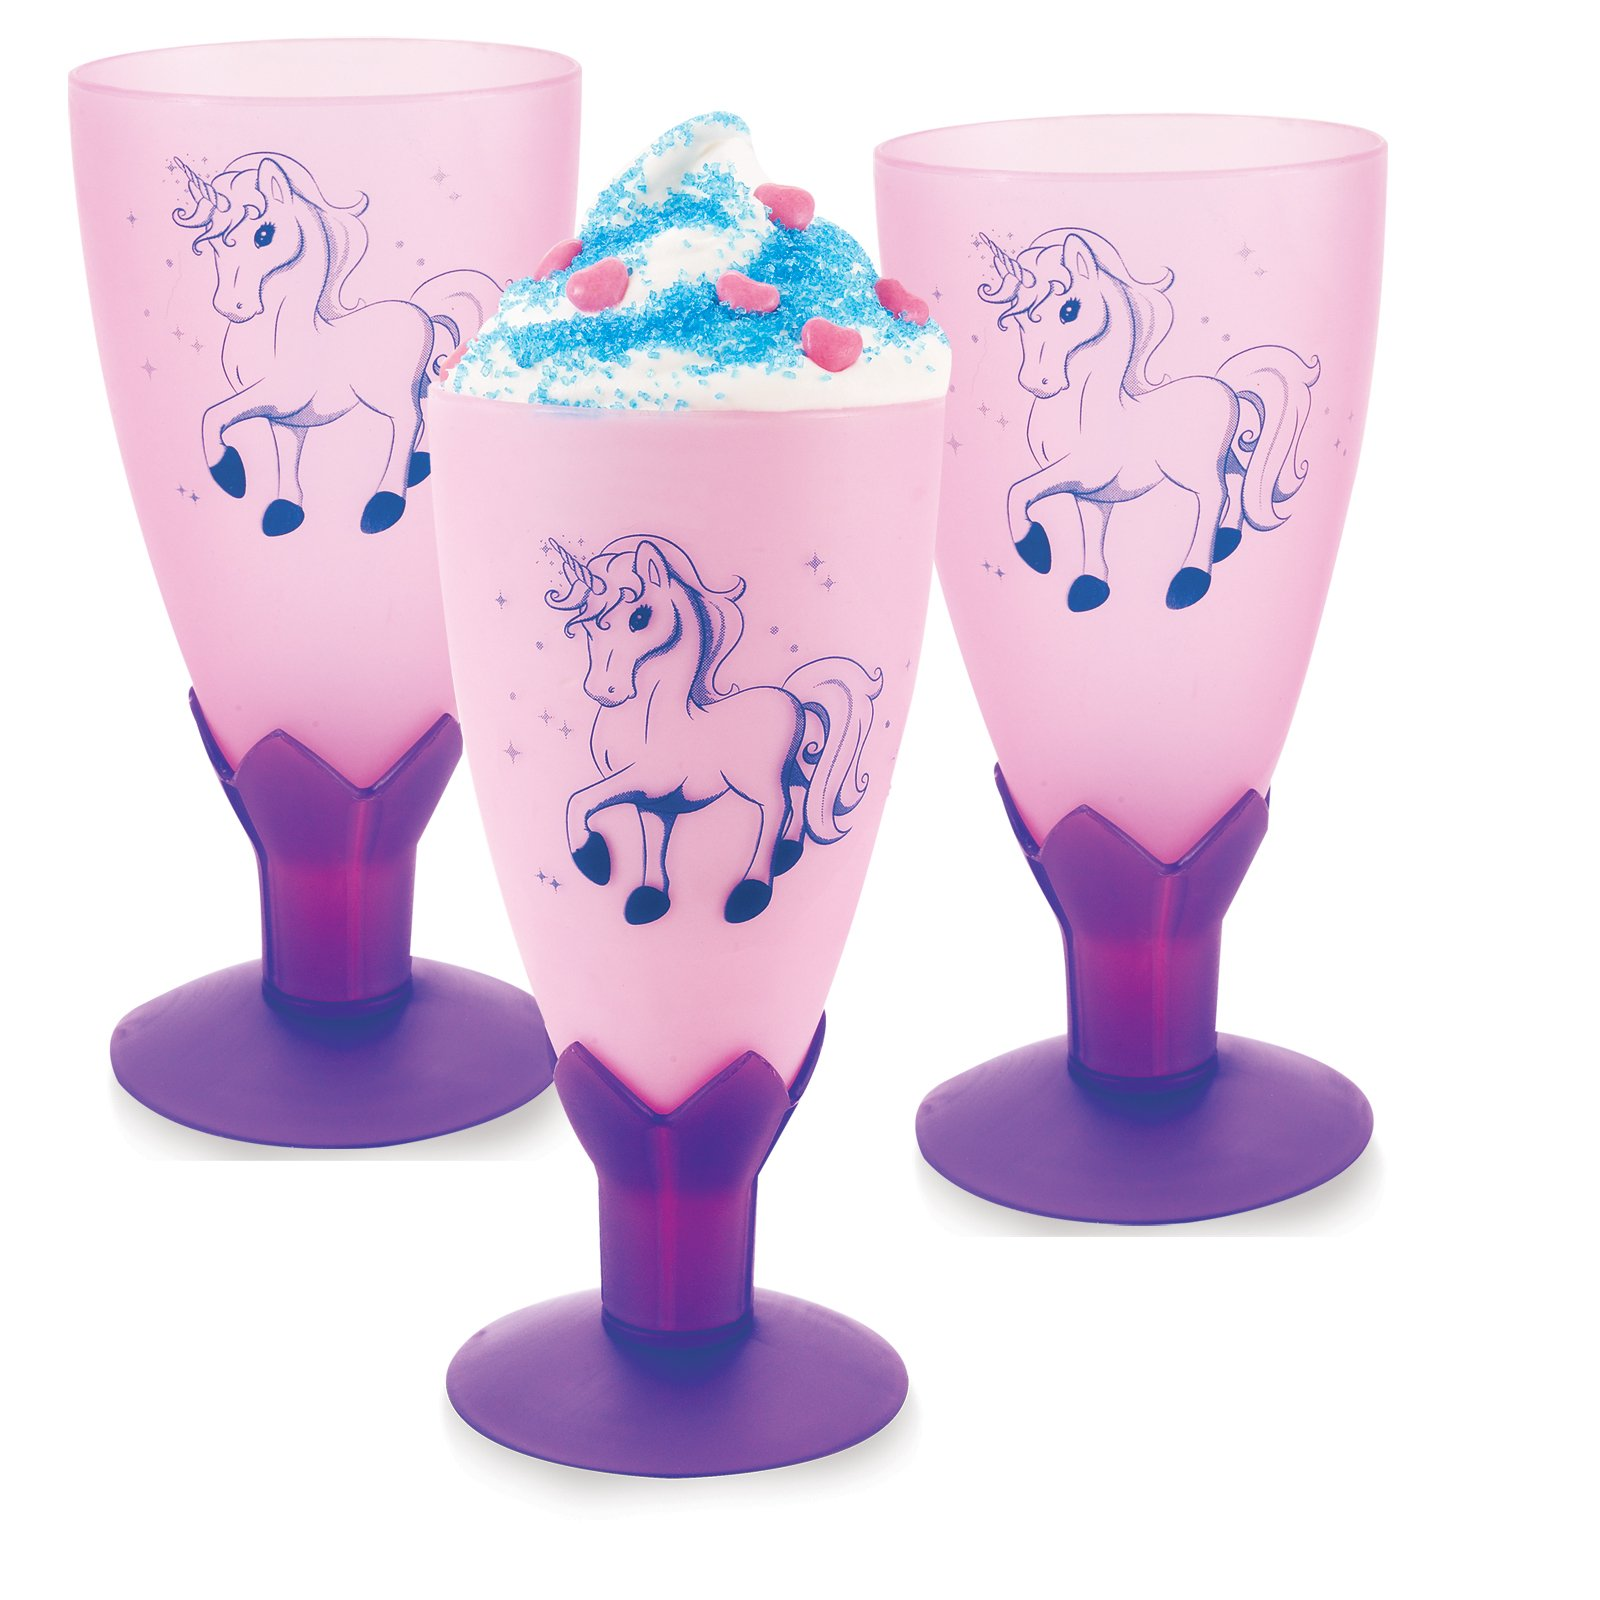 BirthdayExpress Enchanted Unicorn Party Supplies - Goblets (8) by BirthdayExpress